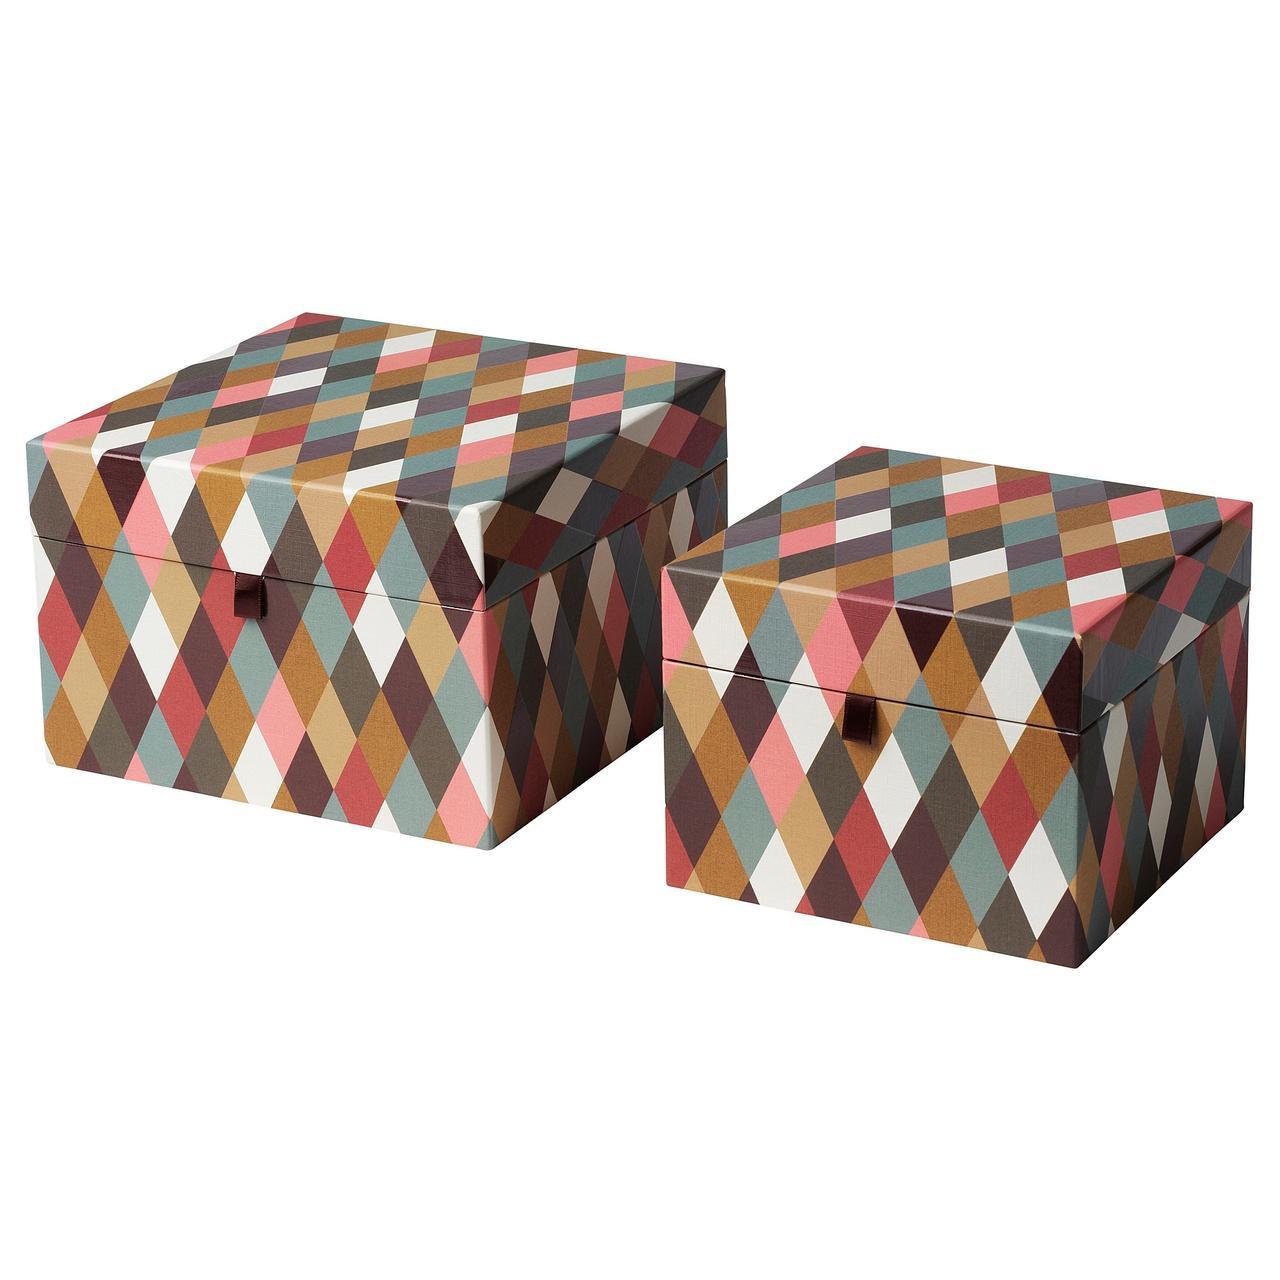 IKEA DEKORERA Коробка с крышкой, 2 шт., шаблон алмаза разноцветные